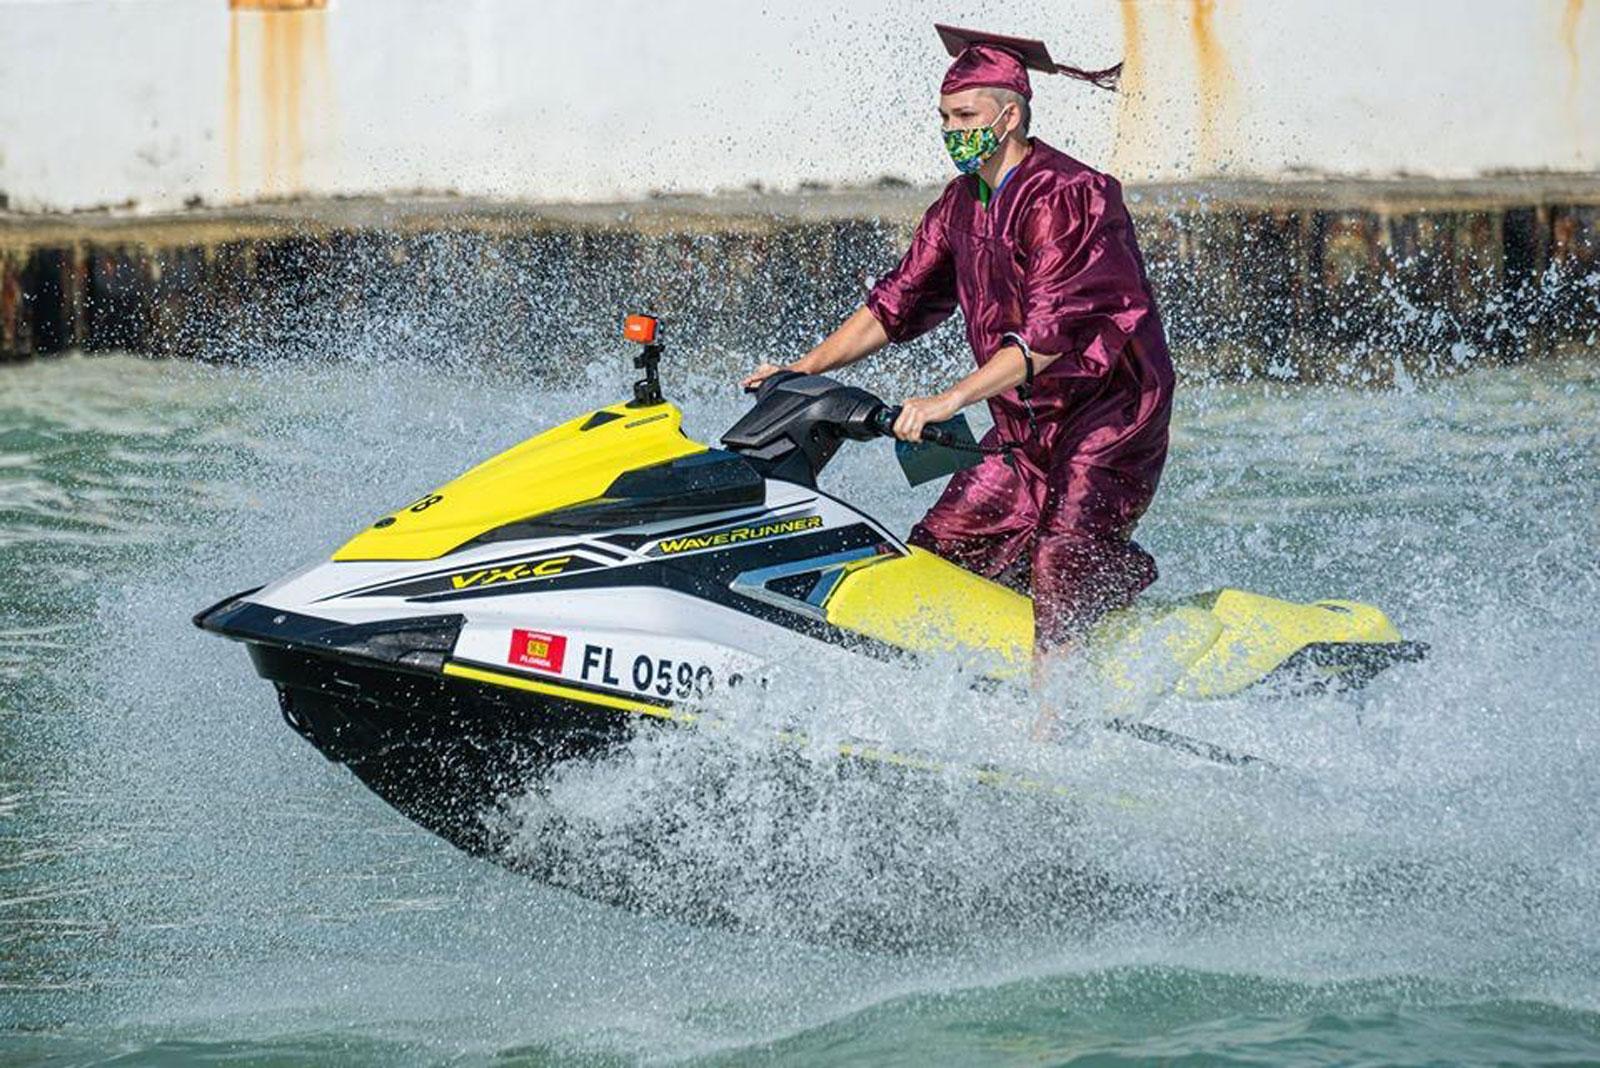 Florida charter school holds graduation ceremony on jet skis